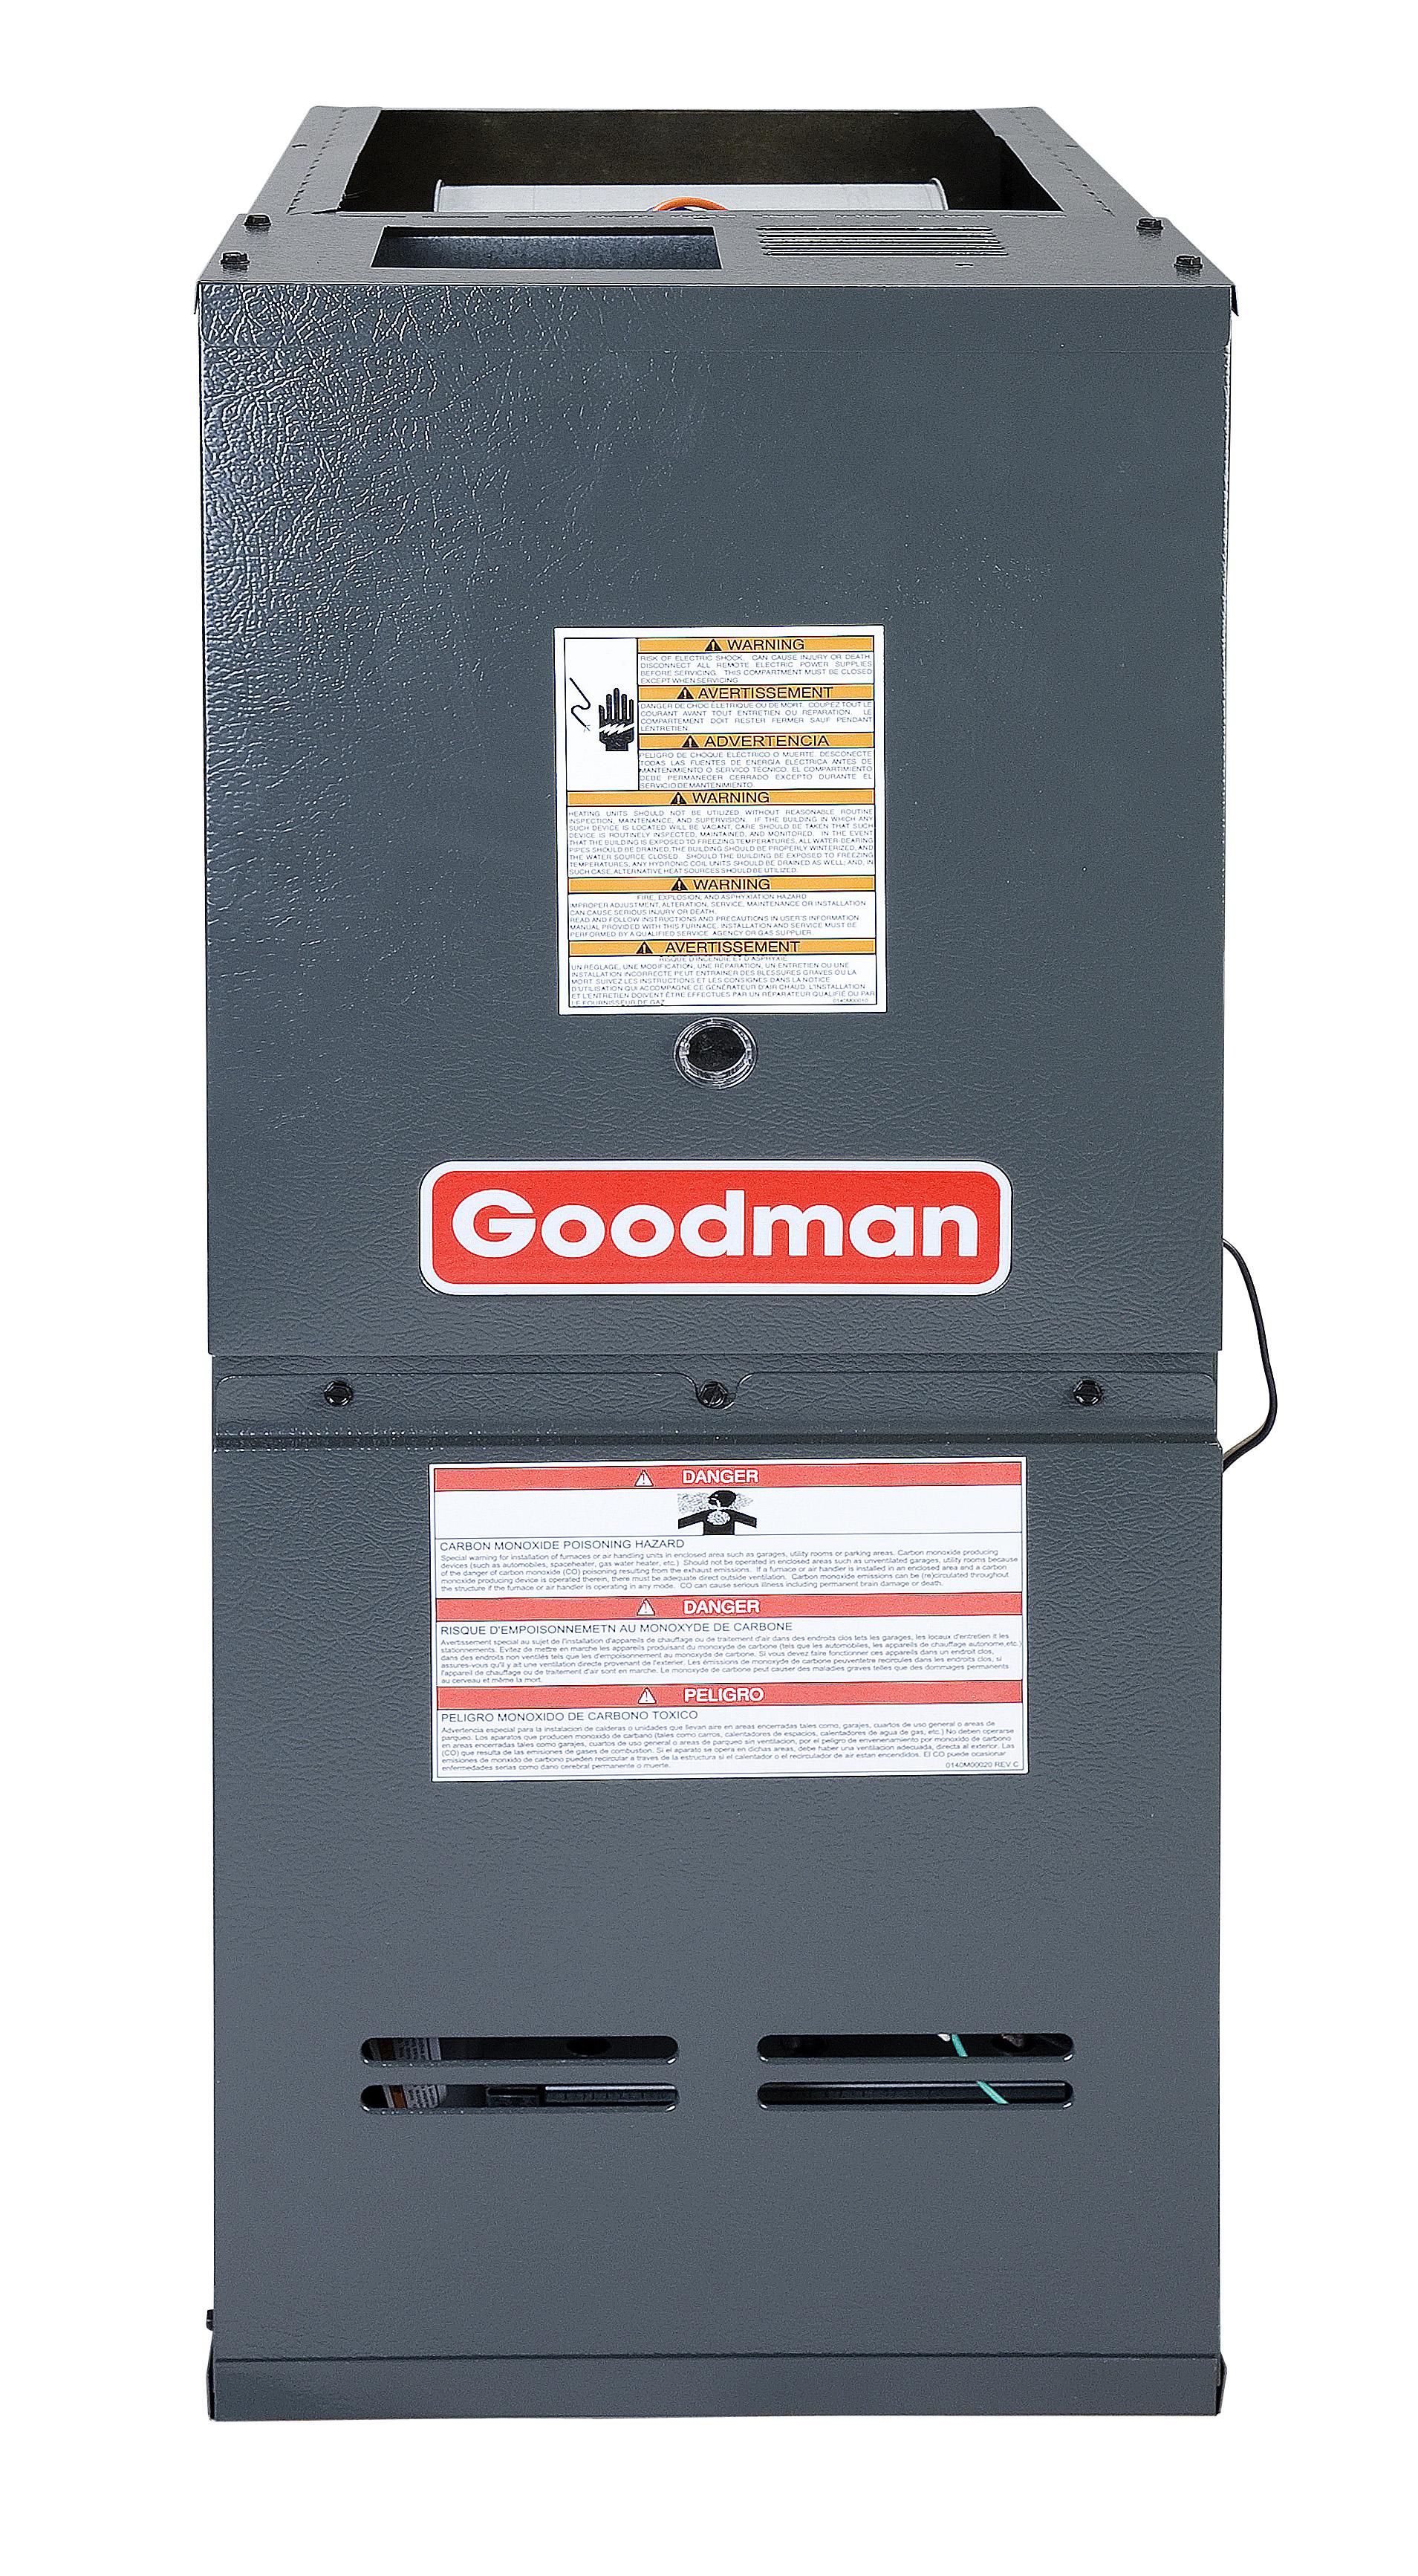 Goodman Gds81005cn 100 000 Btu Furnace 80 Efficiency Single Stage Wiring Diagram For Gas Units Burner 2 Cfm Multi Speed Blower Downflow Application